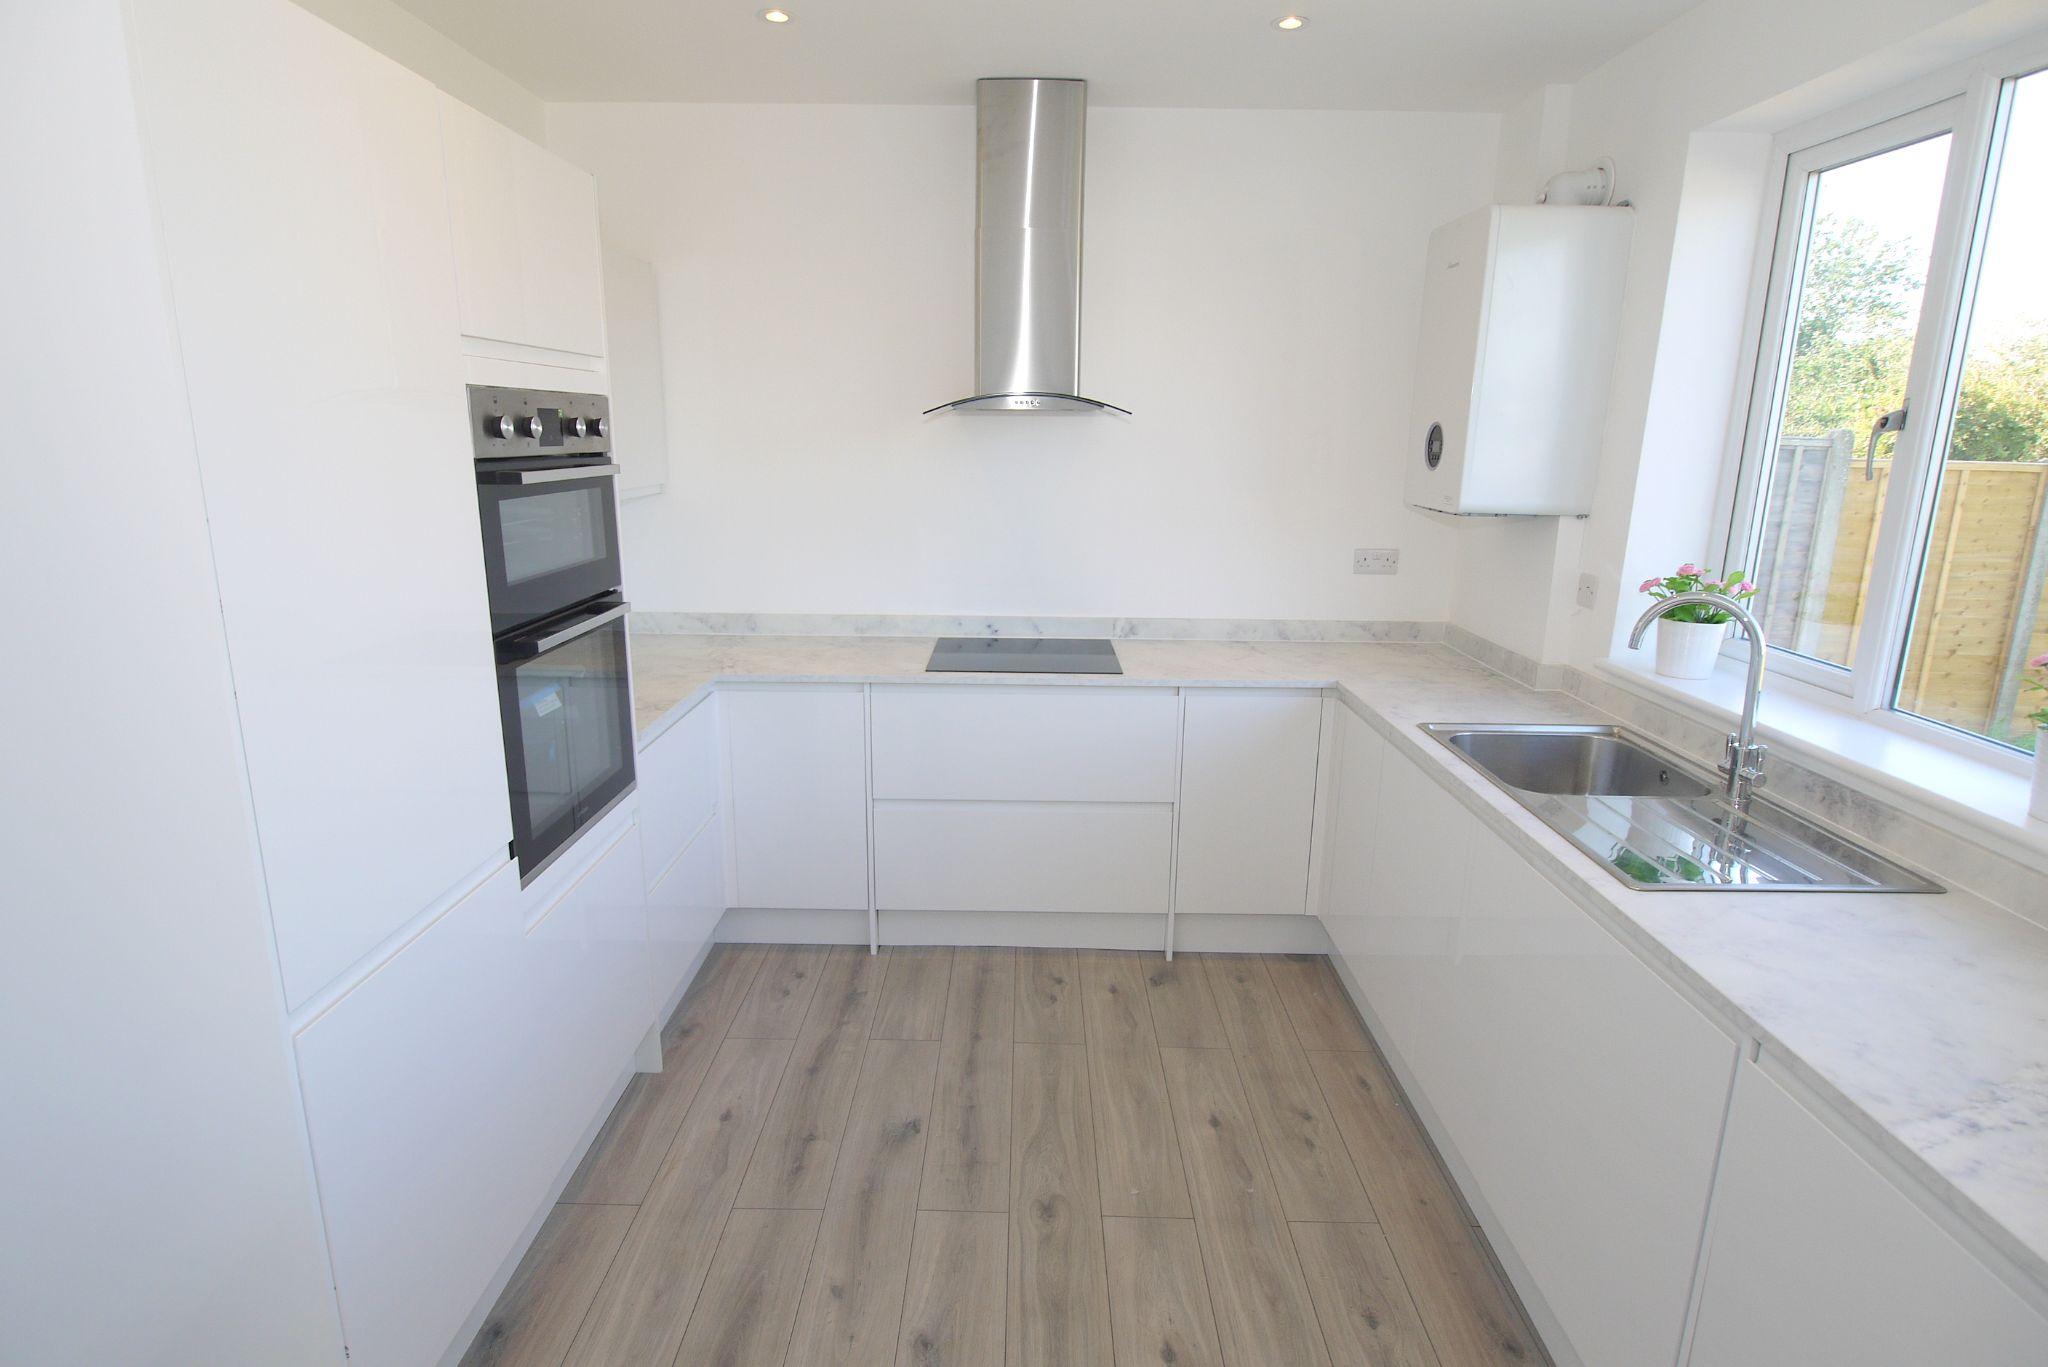 3 bedroom chalet house For Sale in Sevenoaks - Photograph 3